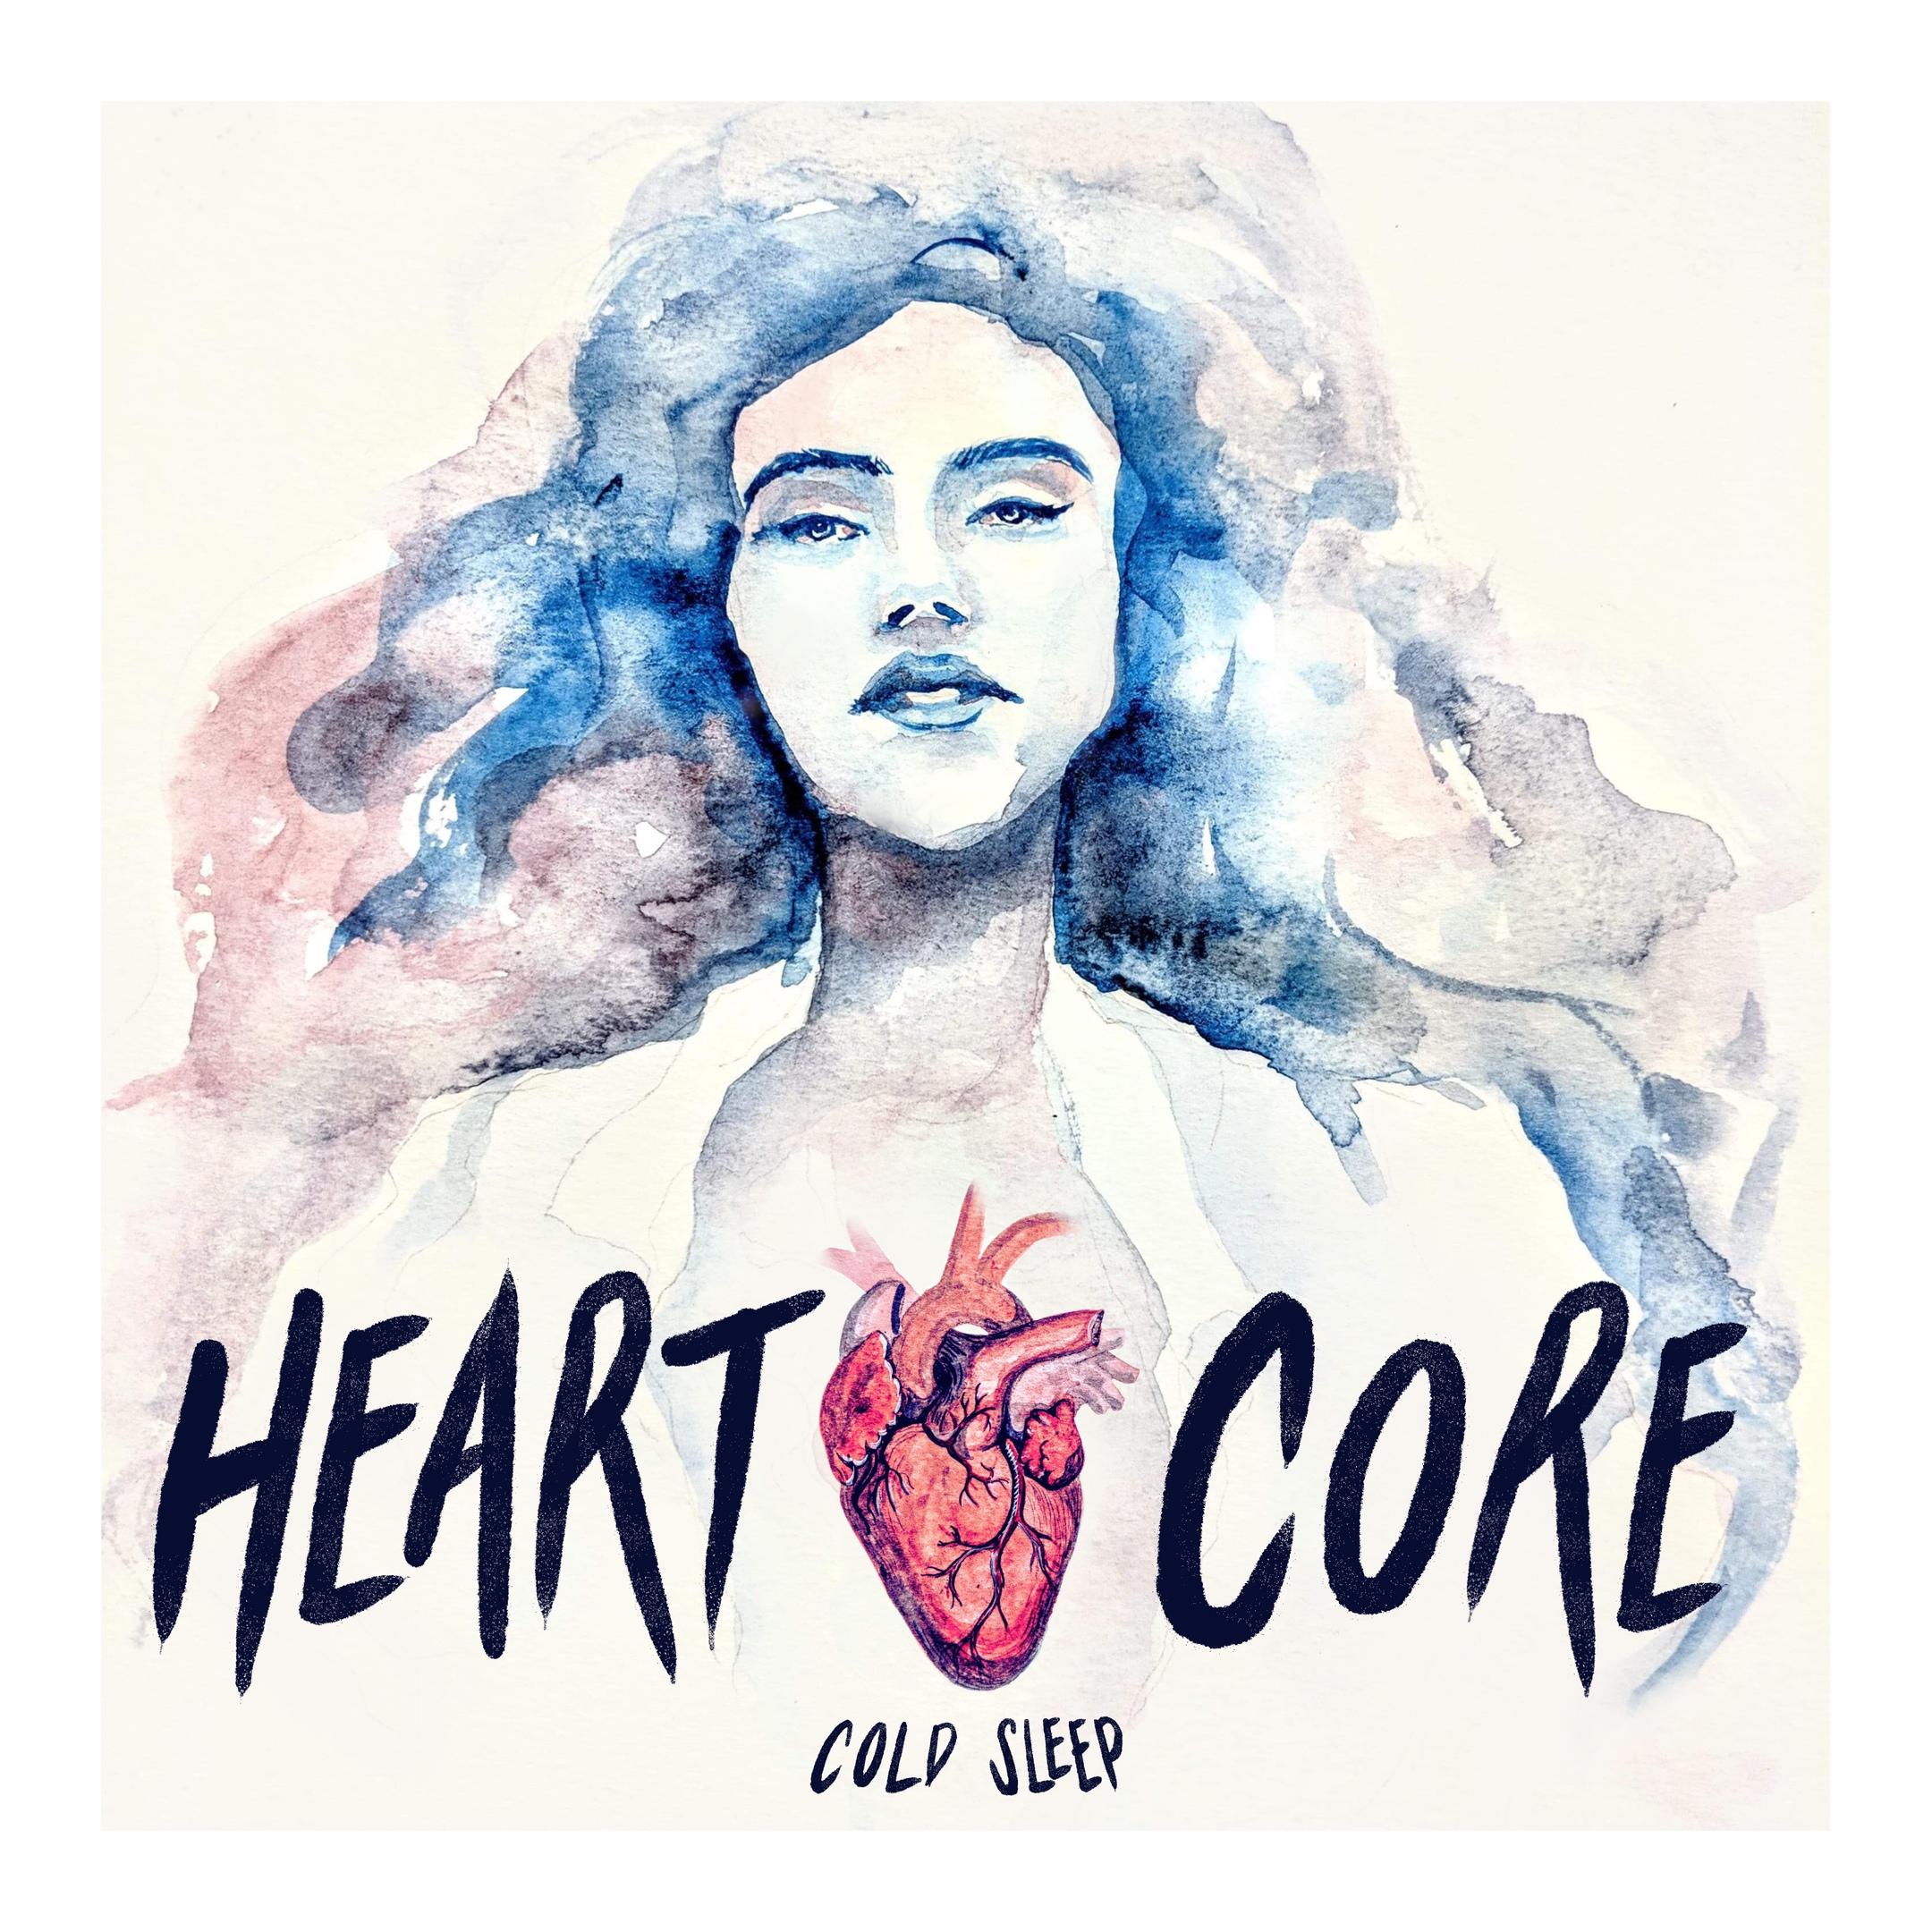 Cold Sleep - Heartcore [EP] (2018)